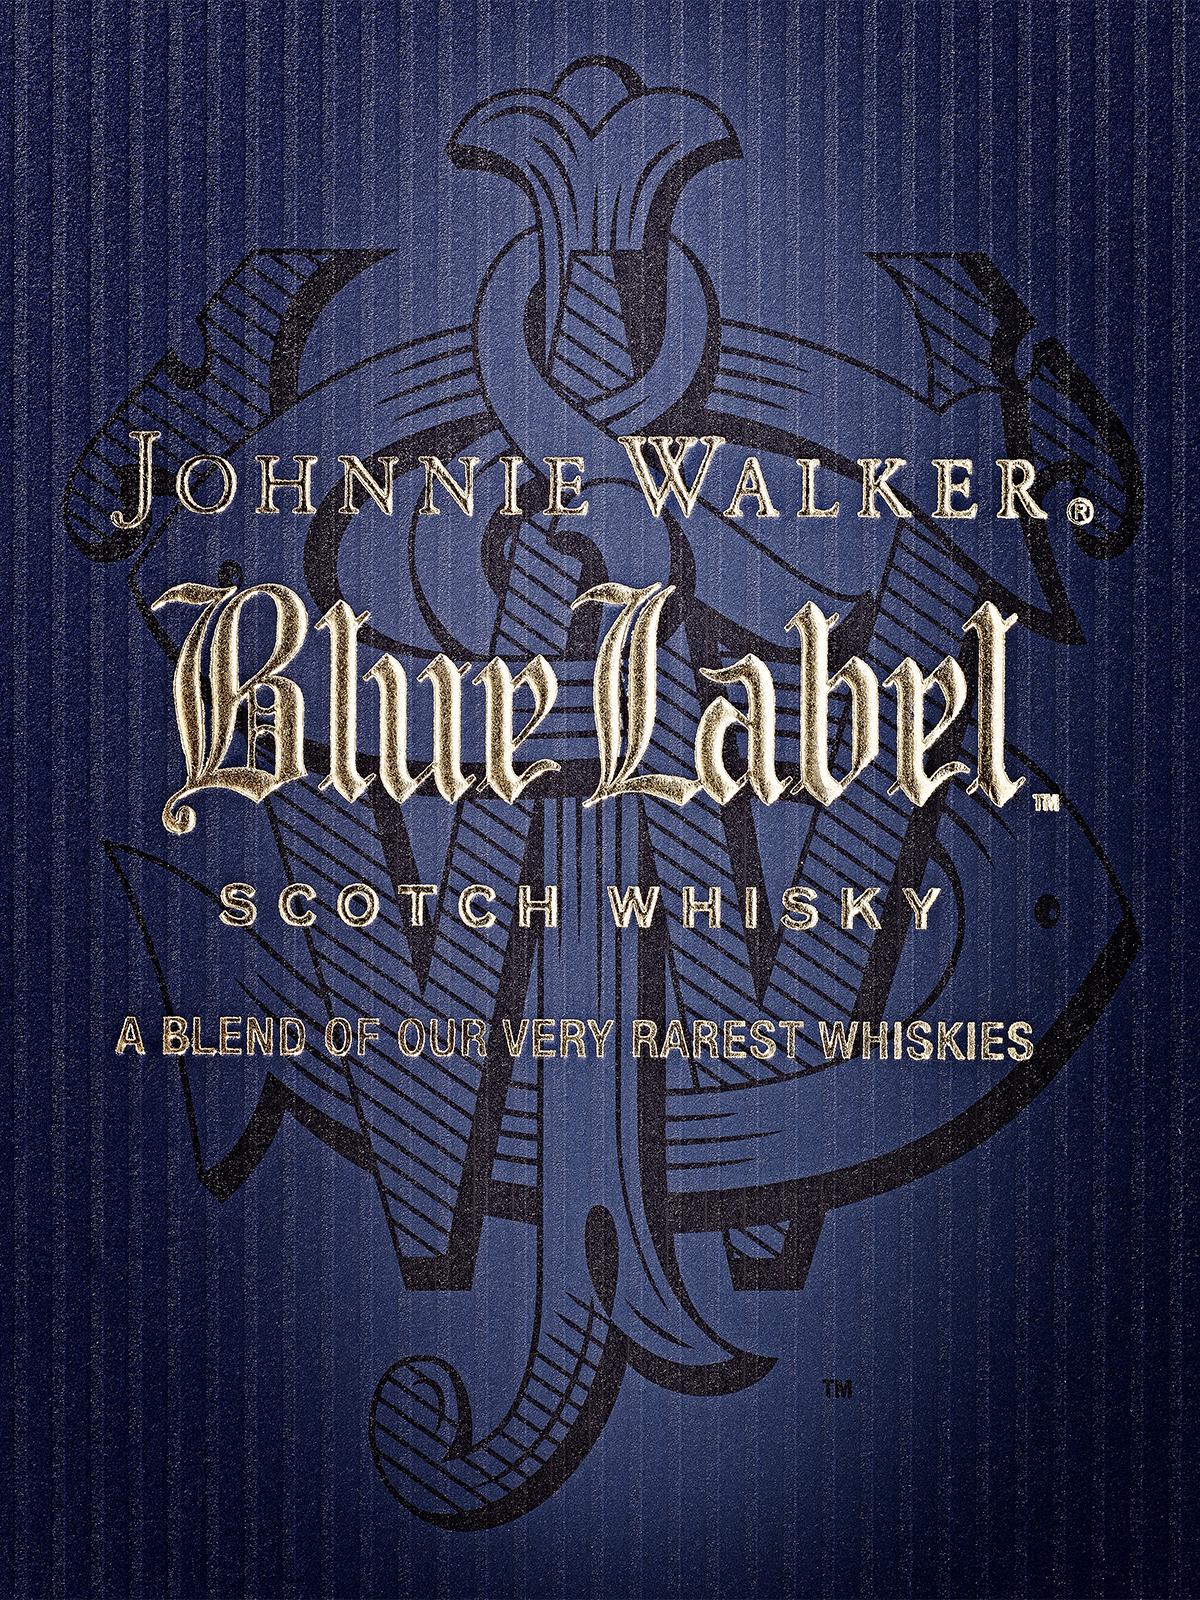 JohnnyWalker01_Workbook.jpg